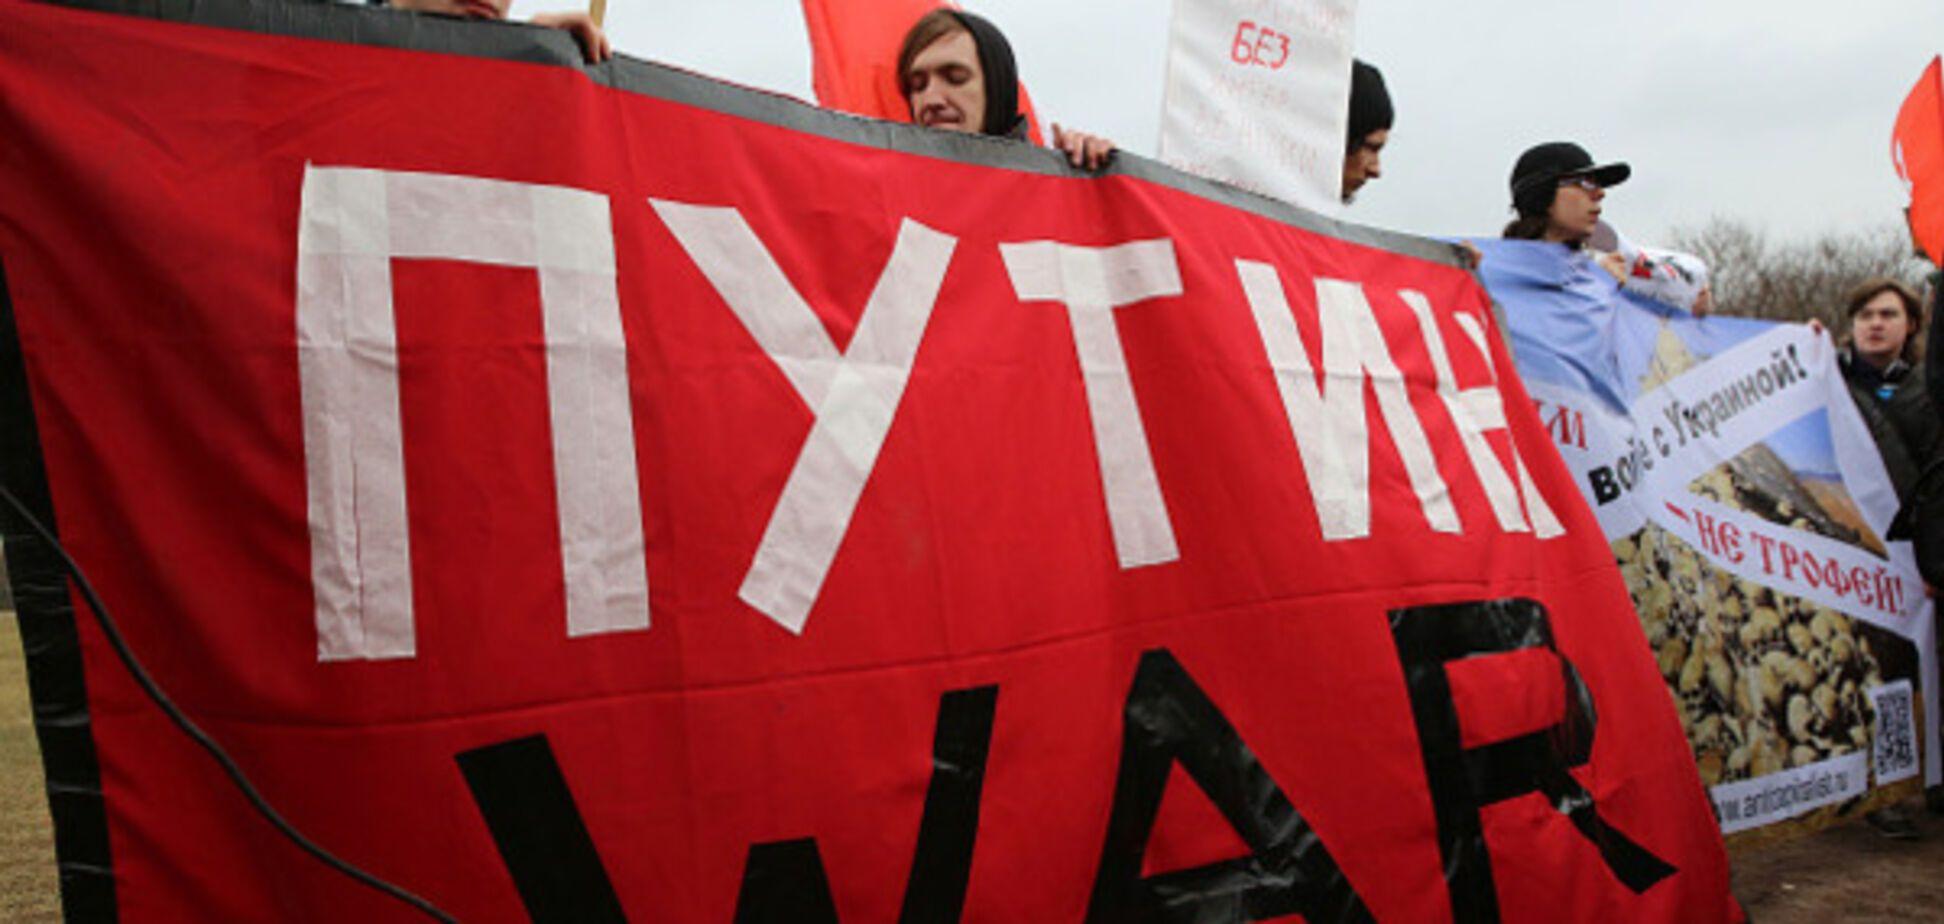 Путін, війна, протест